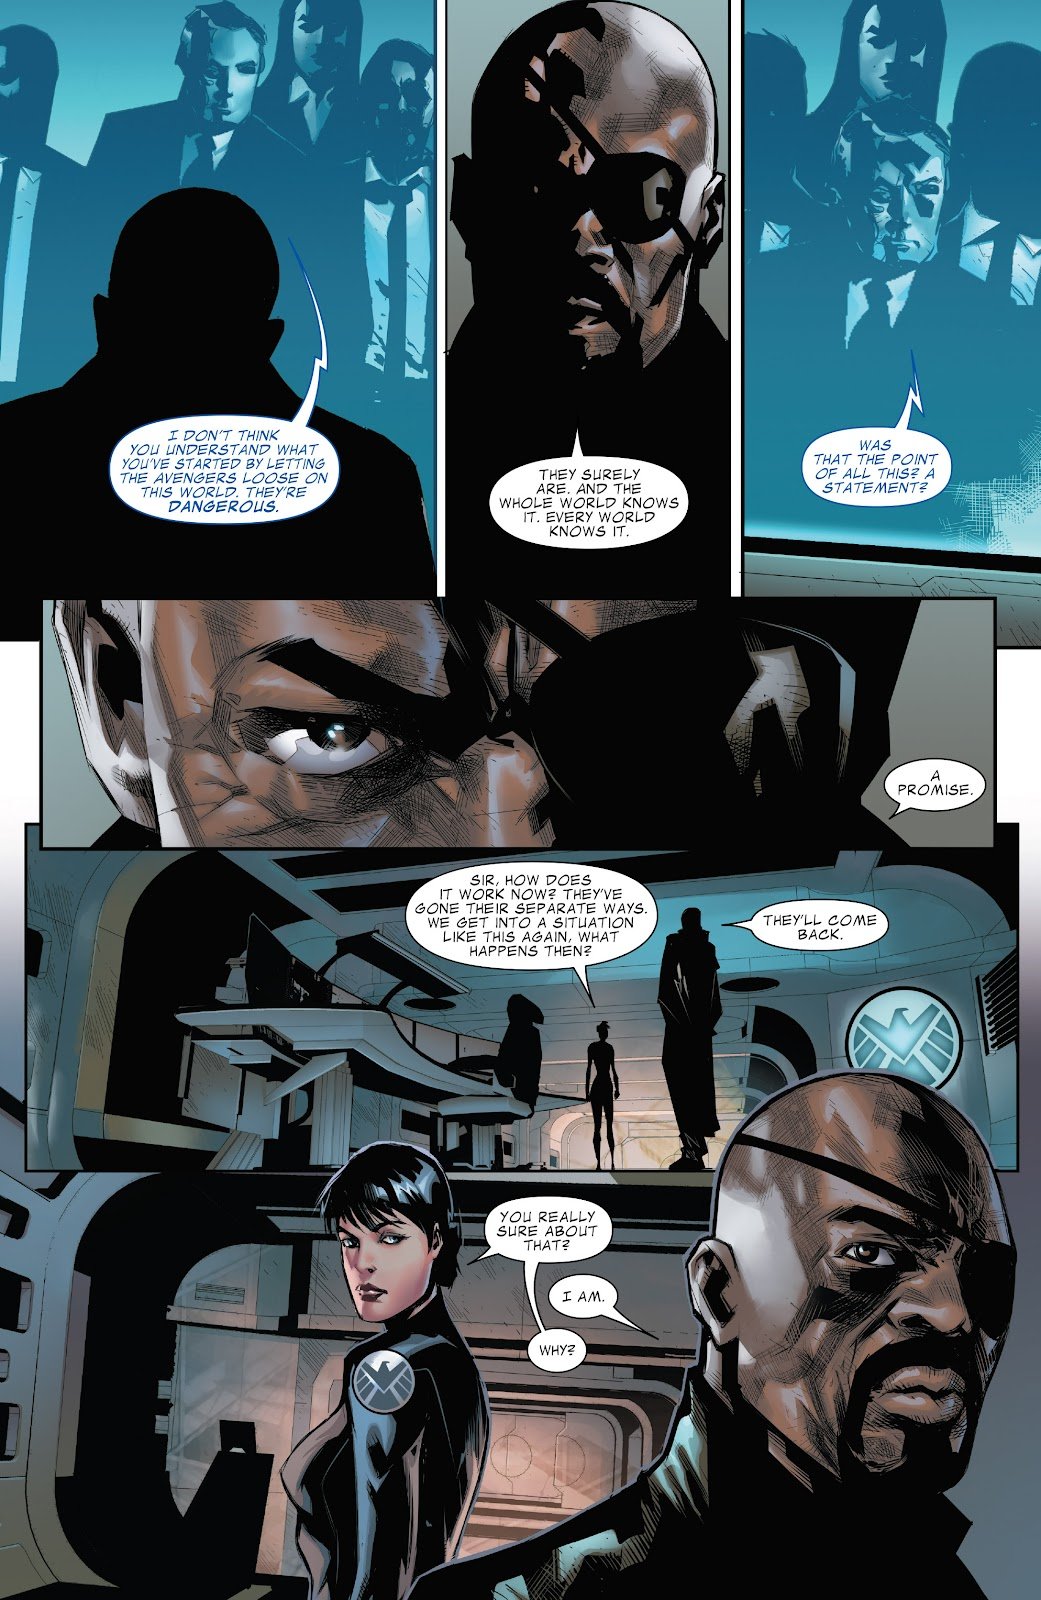 Read online Marvel's The Avengers comic -  Issue #2 - 21